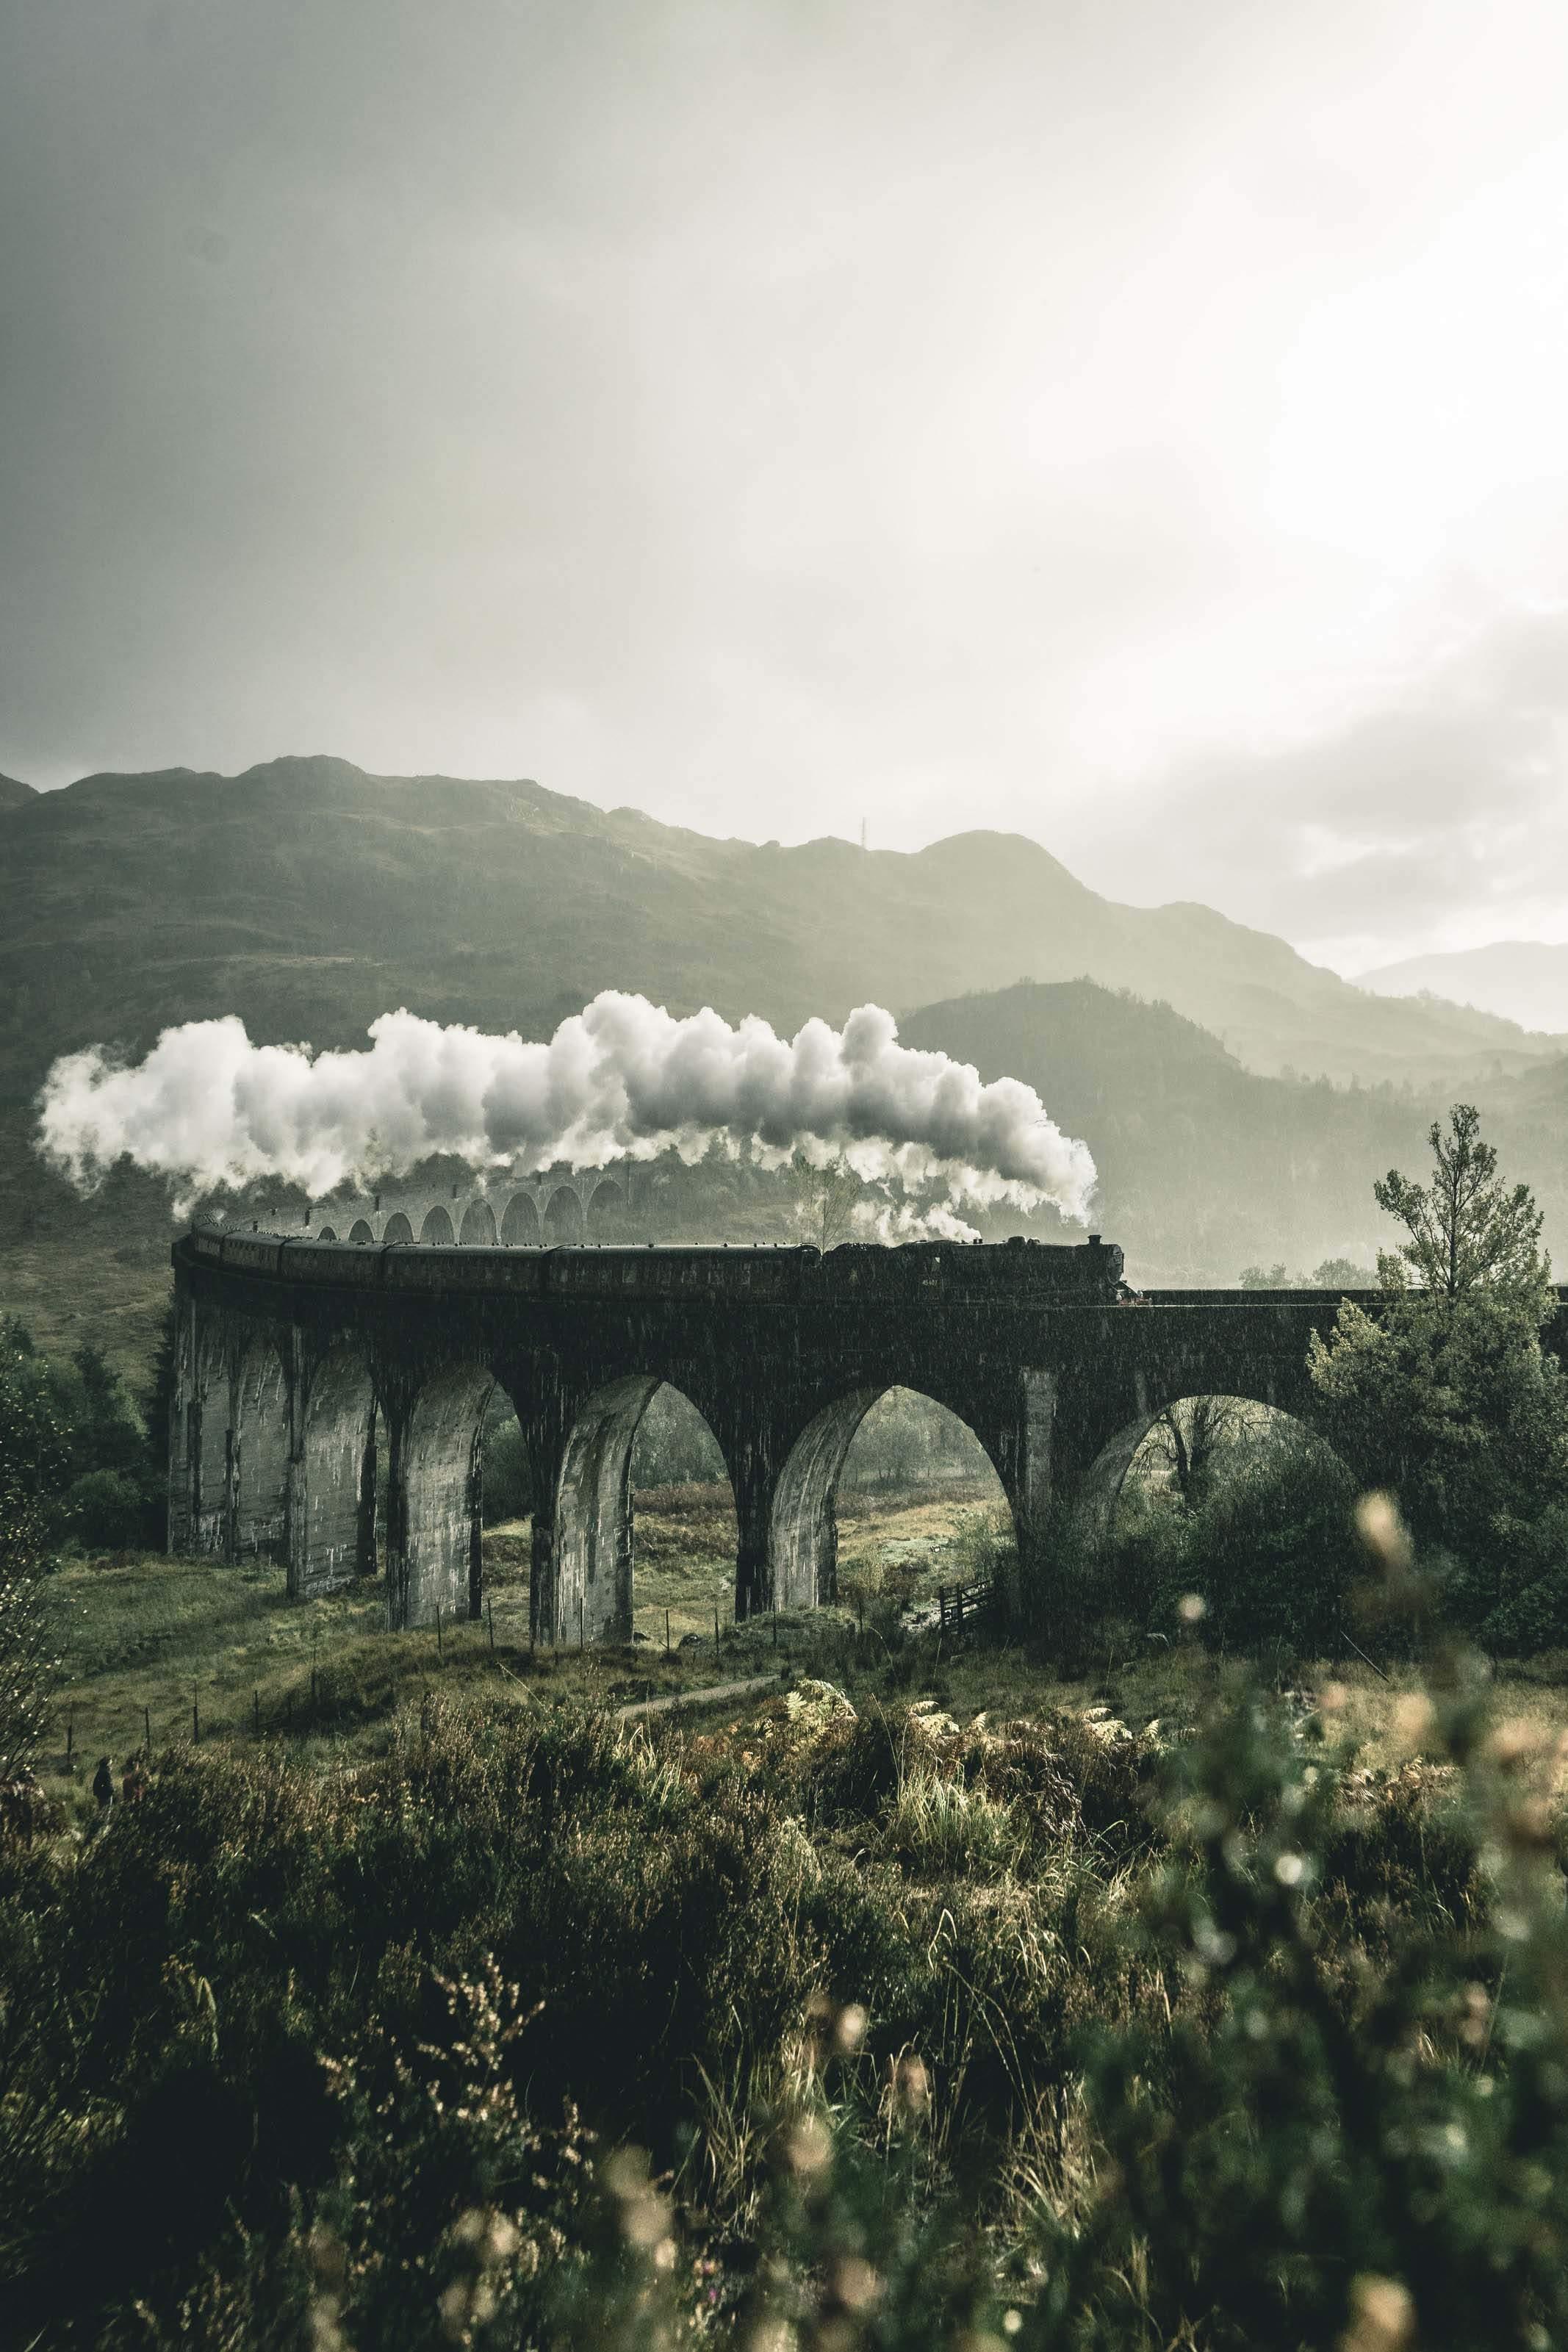 Wallpaper Hp Keren Gambar Kereta Dan Jembatan No Good